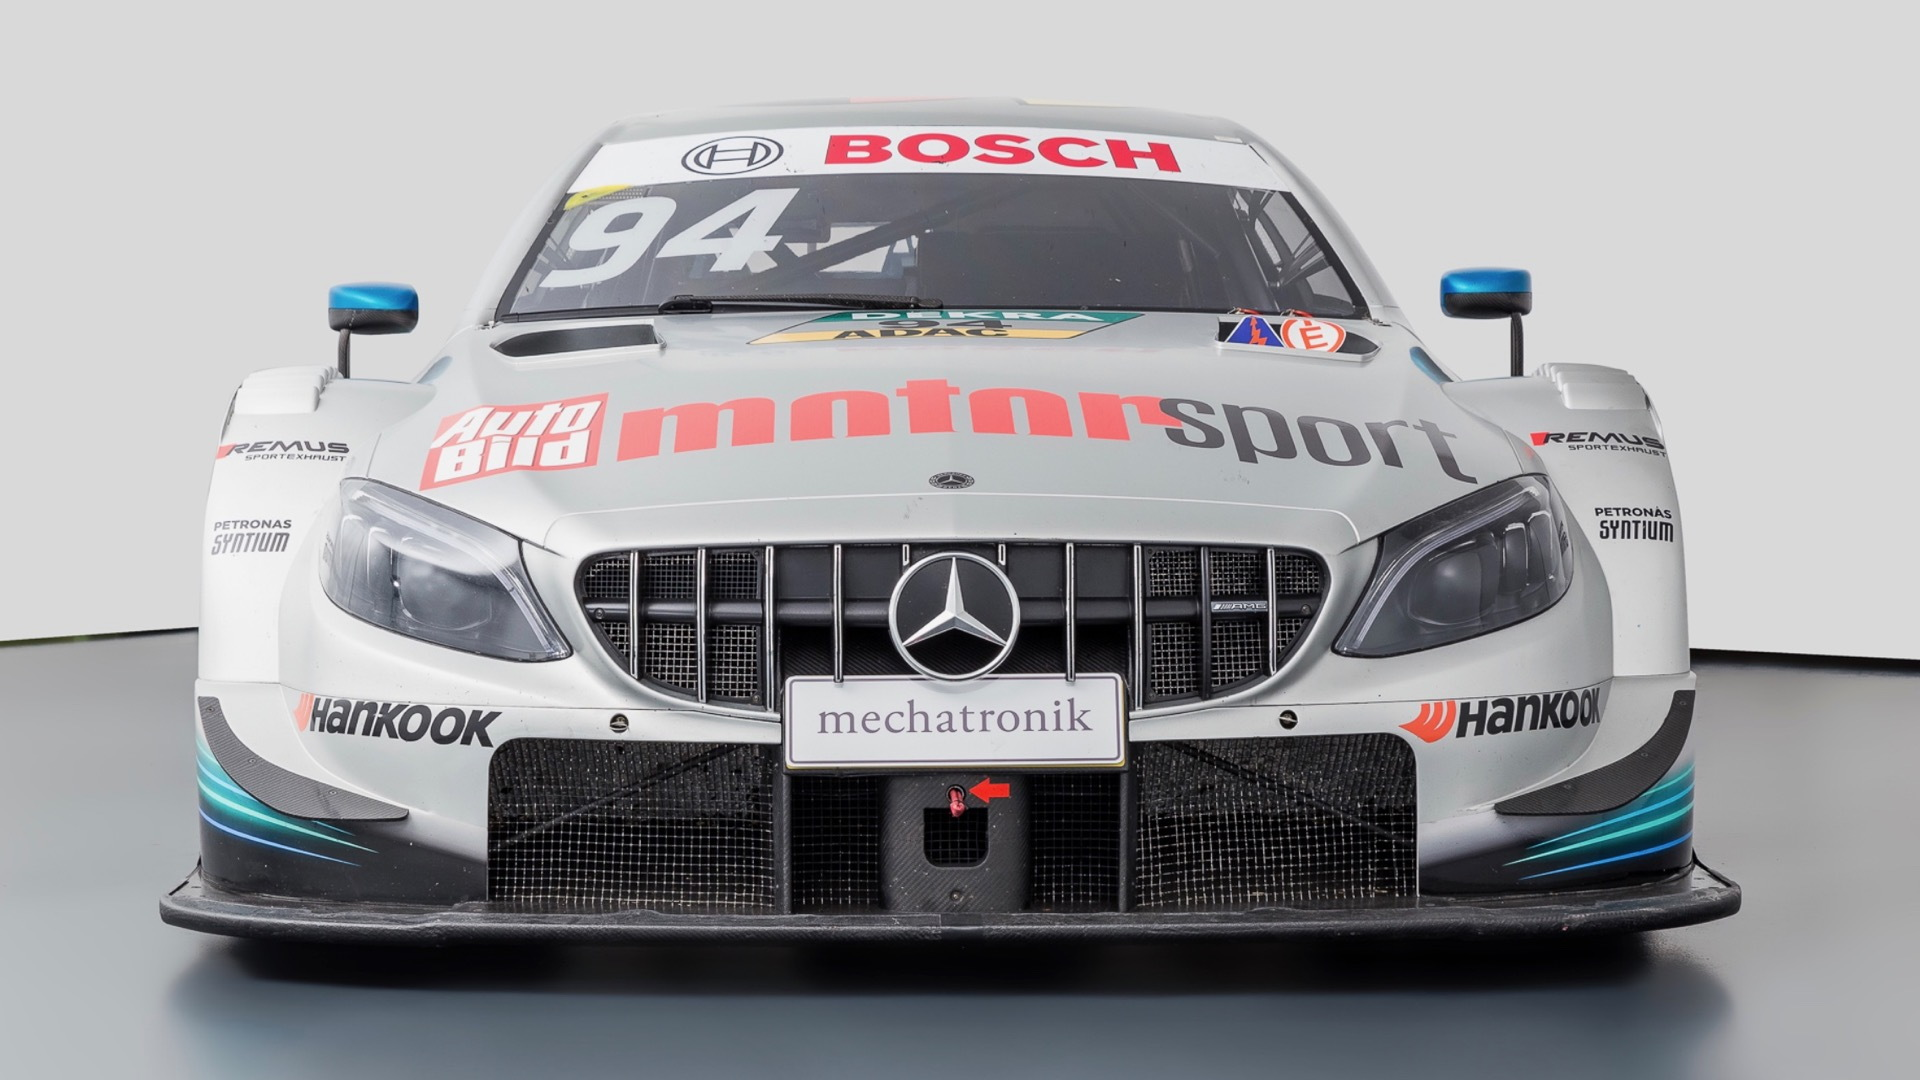 2014 Mercedes-Benz C63 AMG DTM race car (photo via Mechatronik)